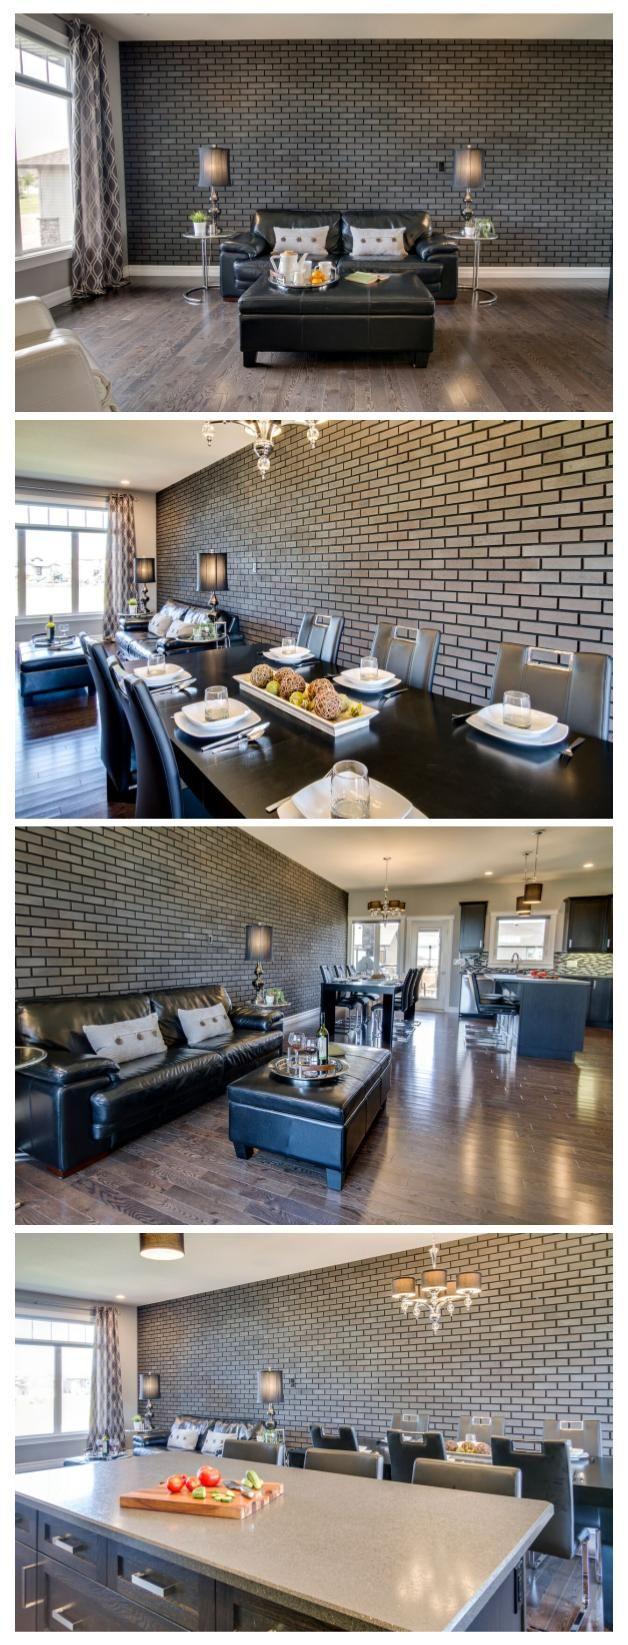 12 Best Modernbrick Panelized Interior Brick Wall System